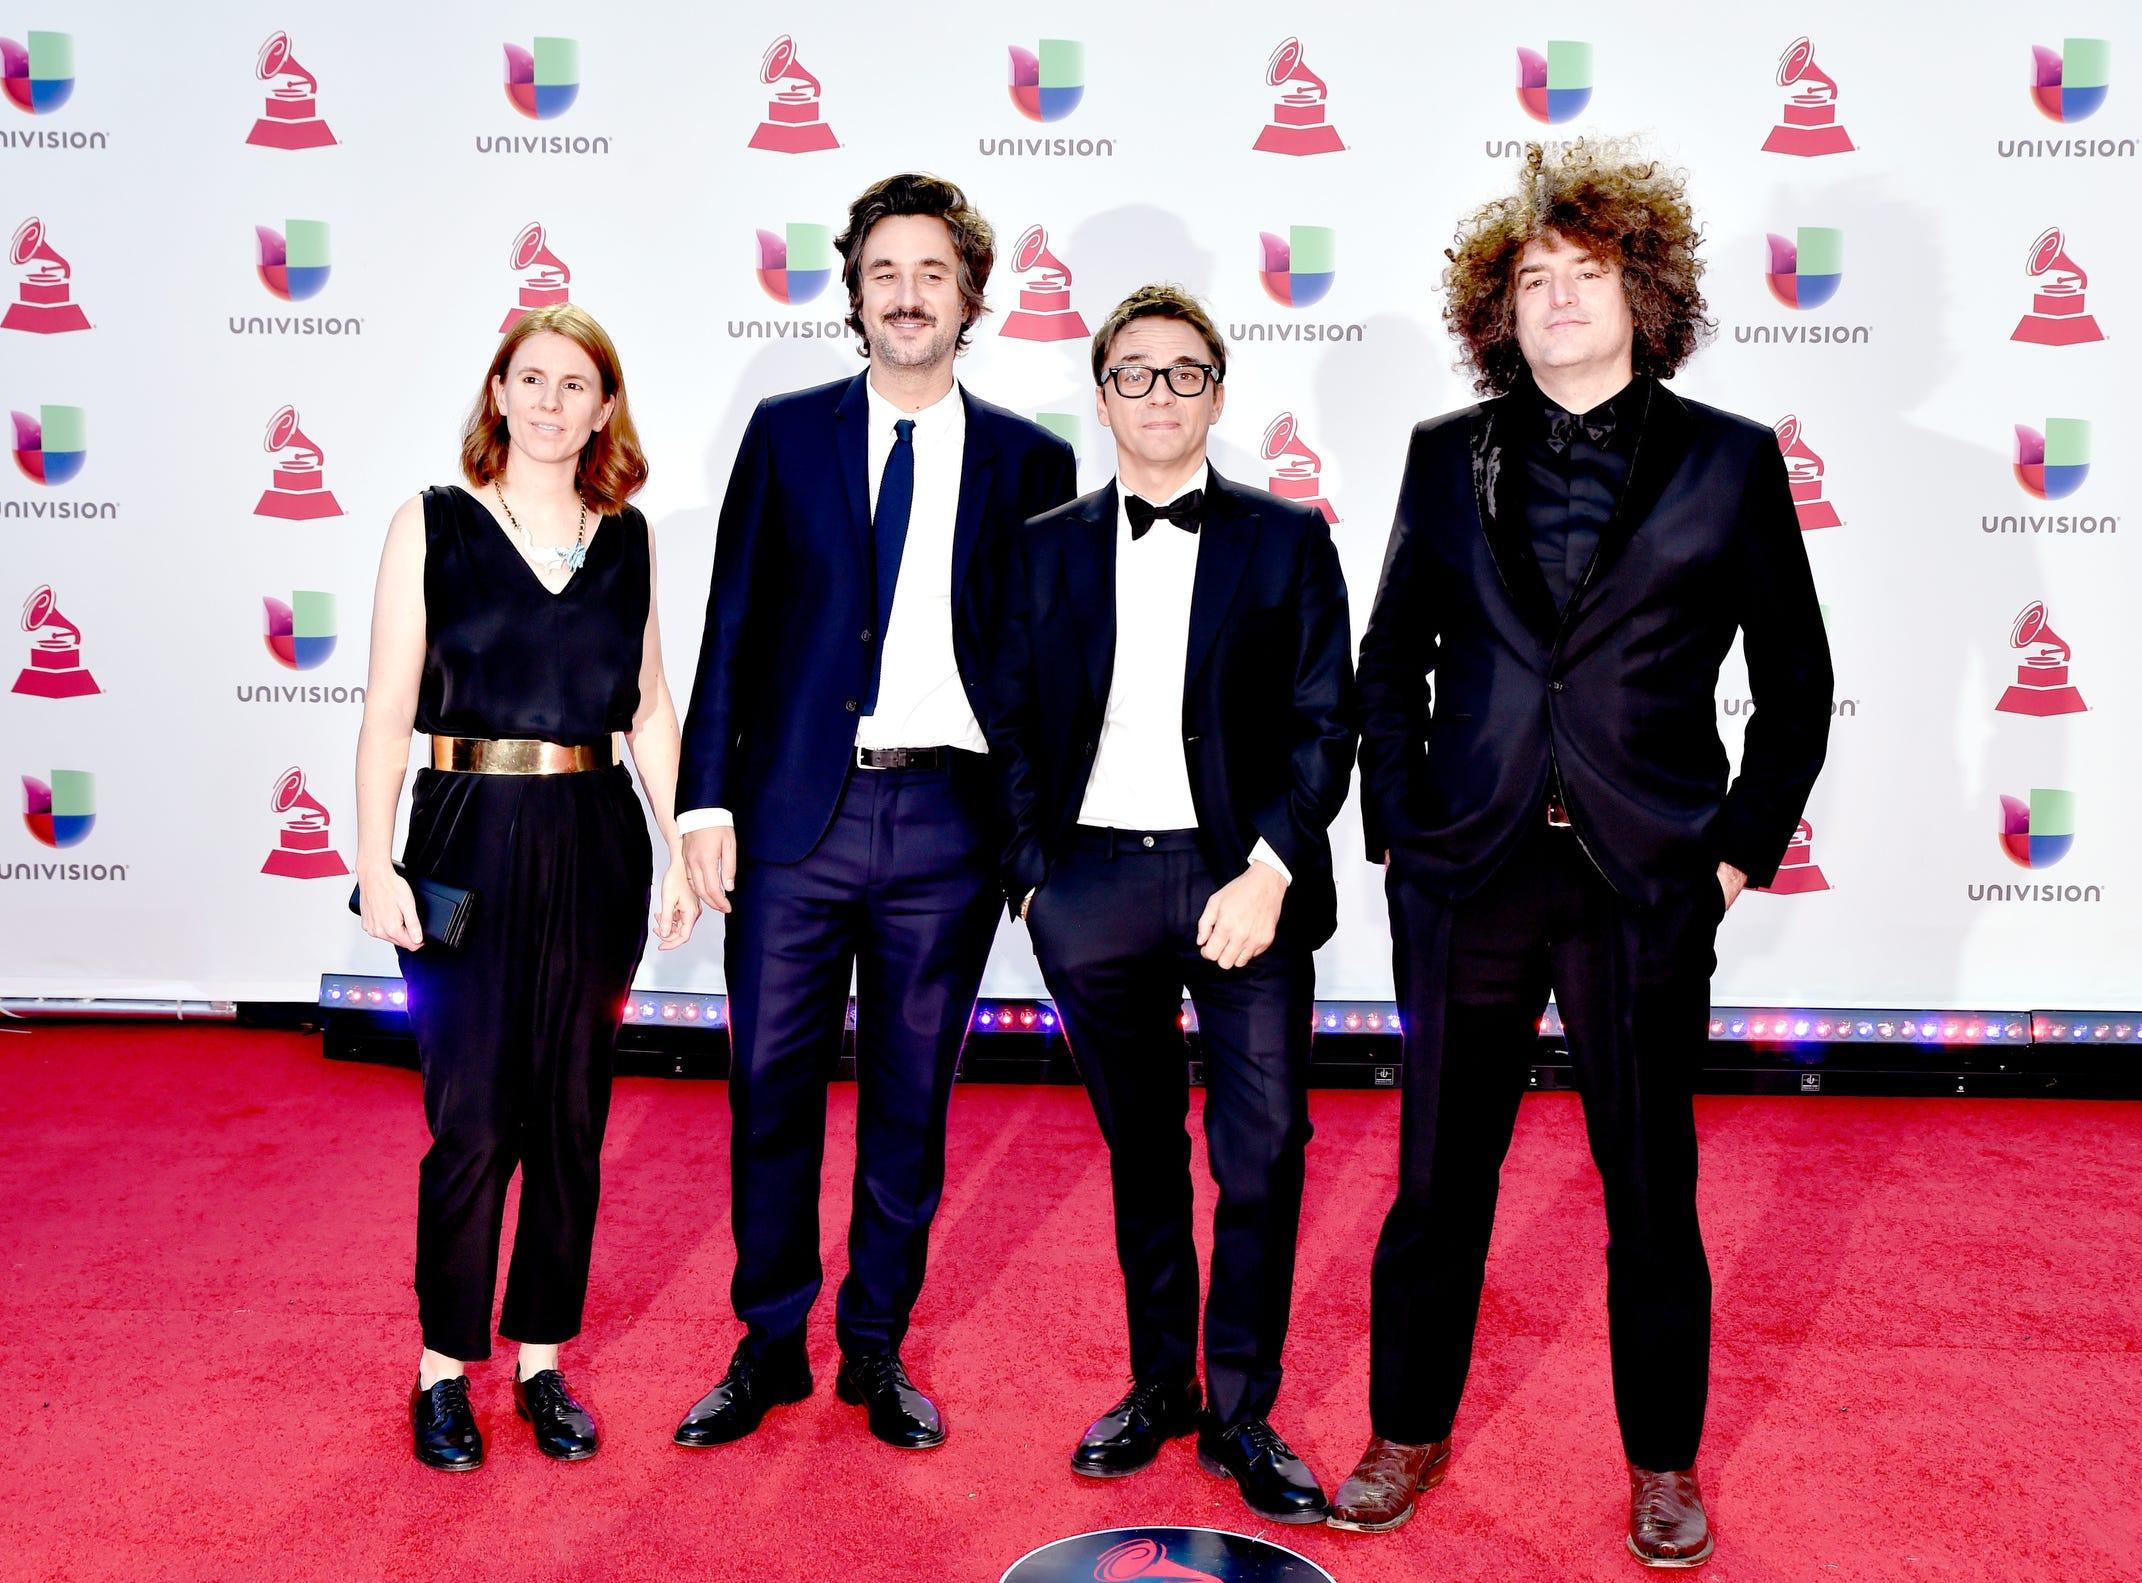 Alba Barneda, left, Nicolas Mendez, Lope Serrano, and Oscar Romagosa